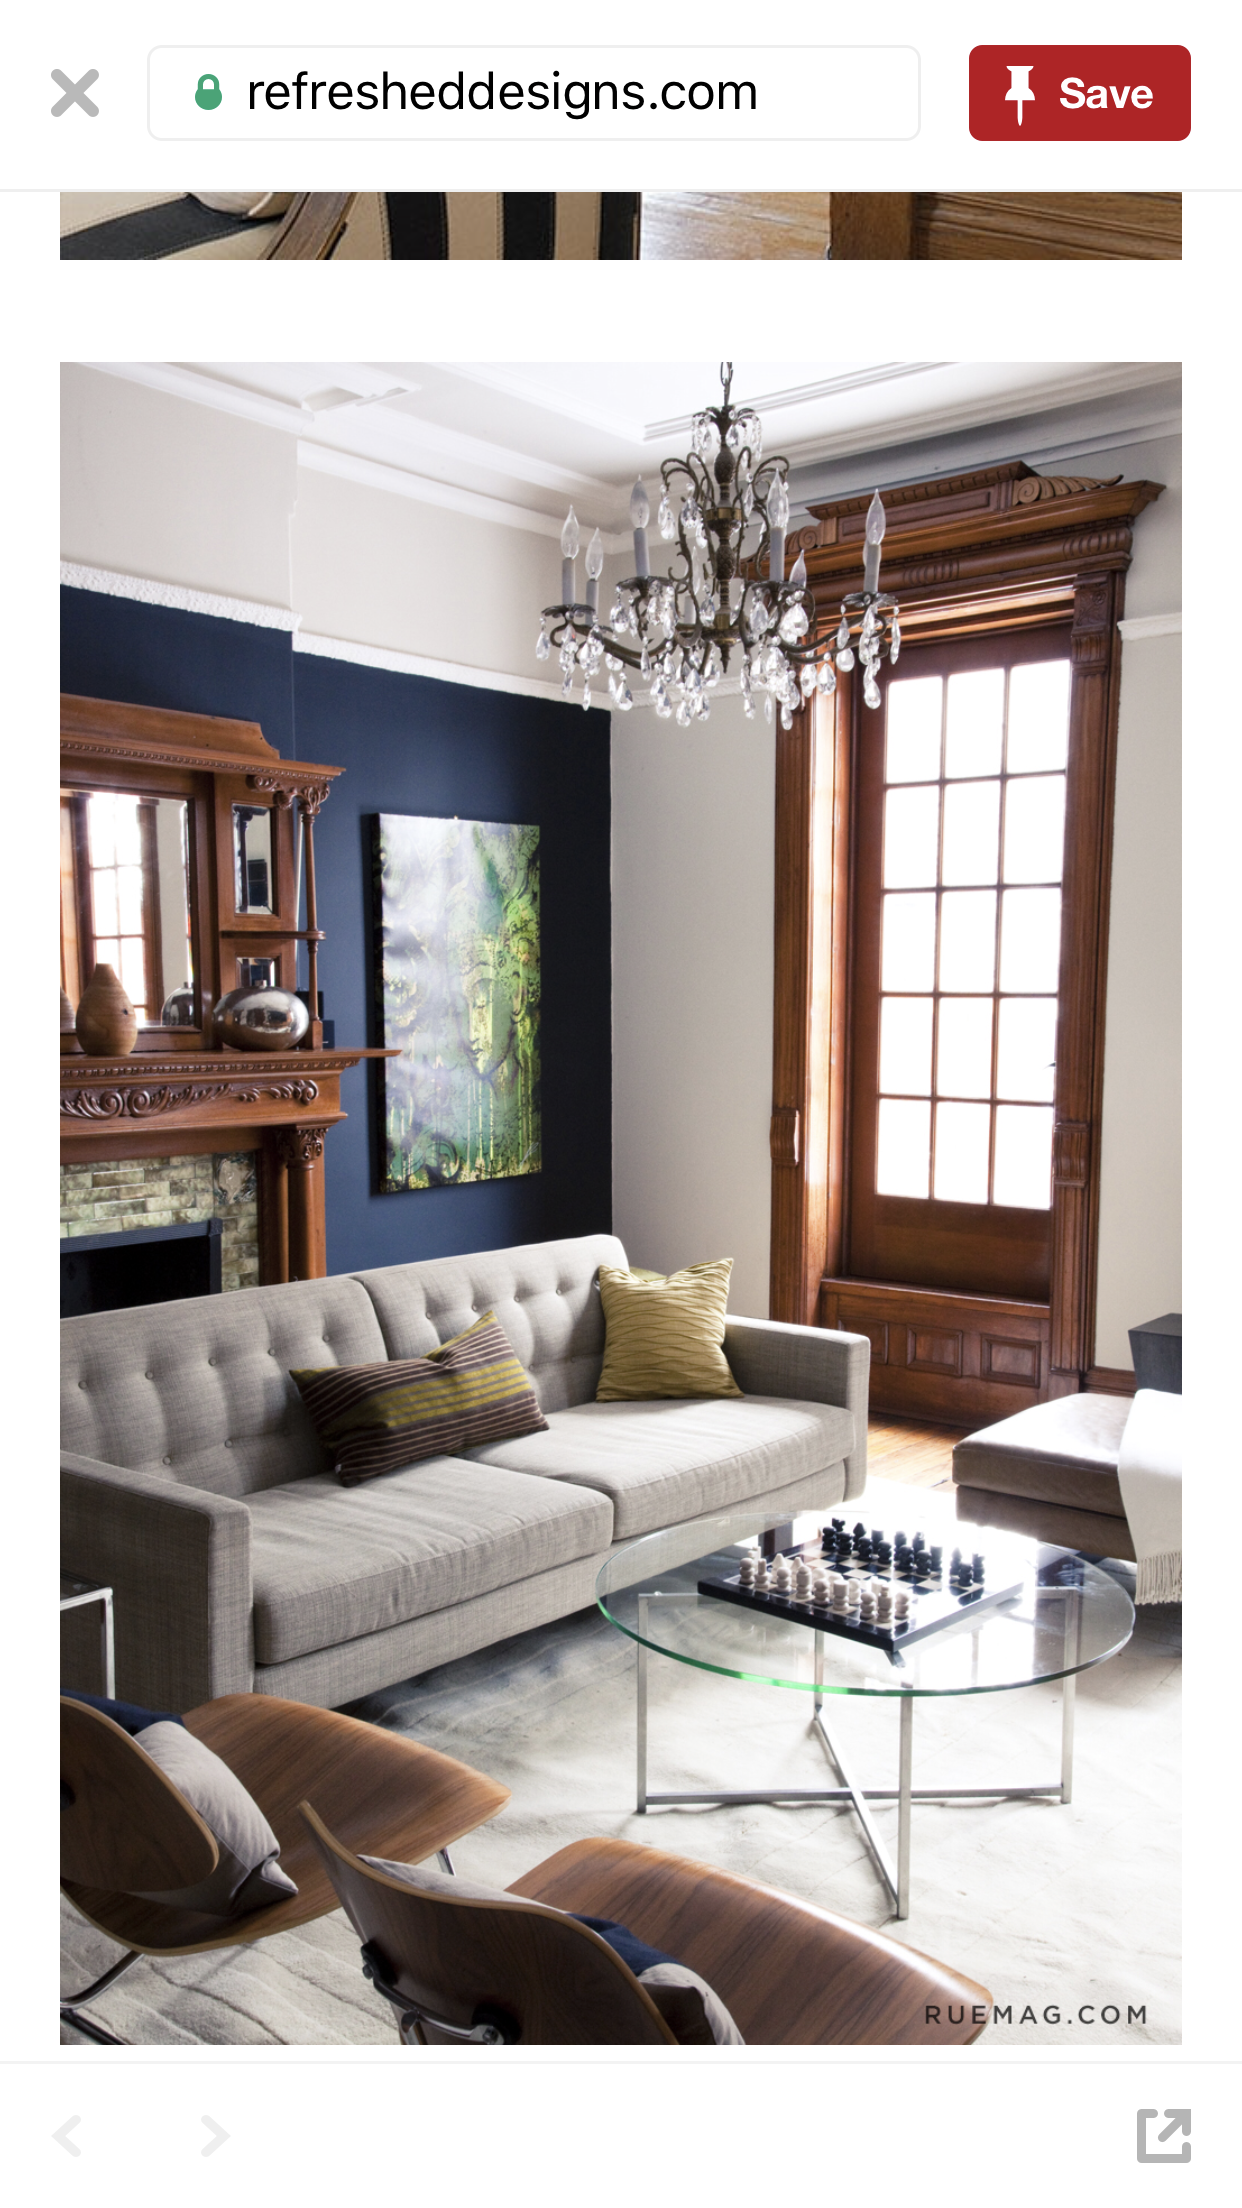 Pin by Kaylee Vankirk on New home ️ Living room paint